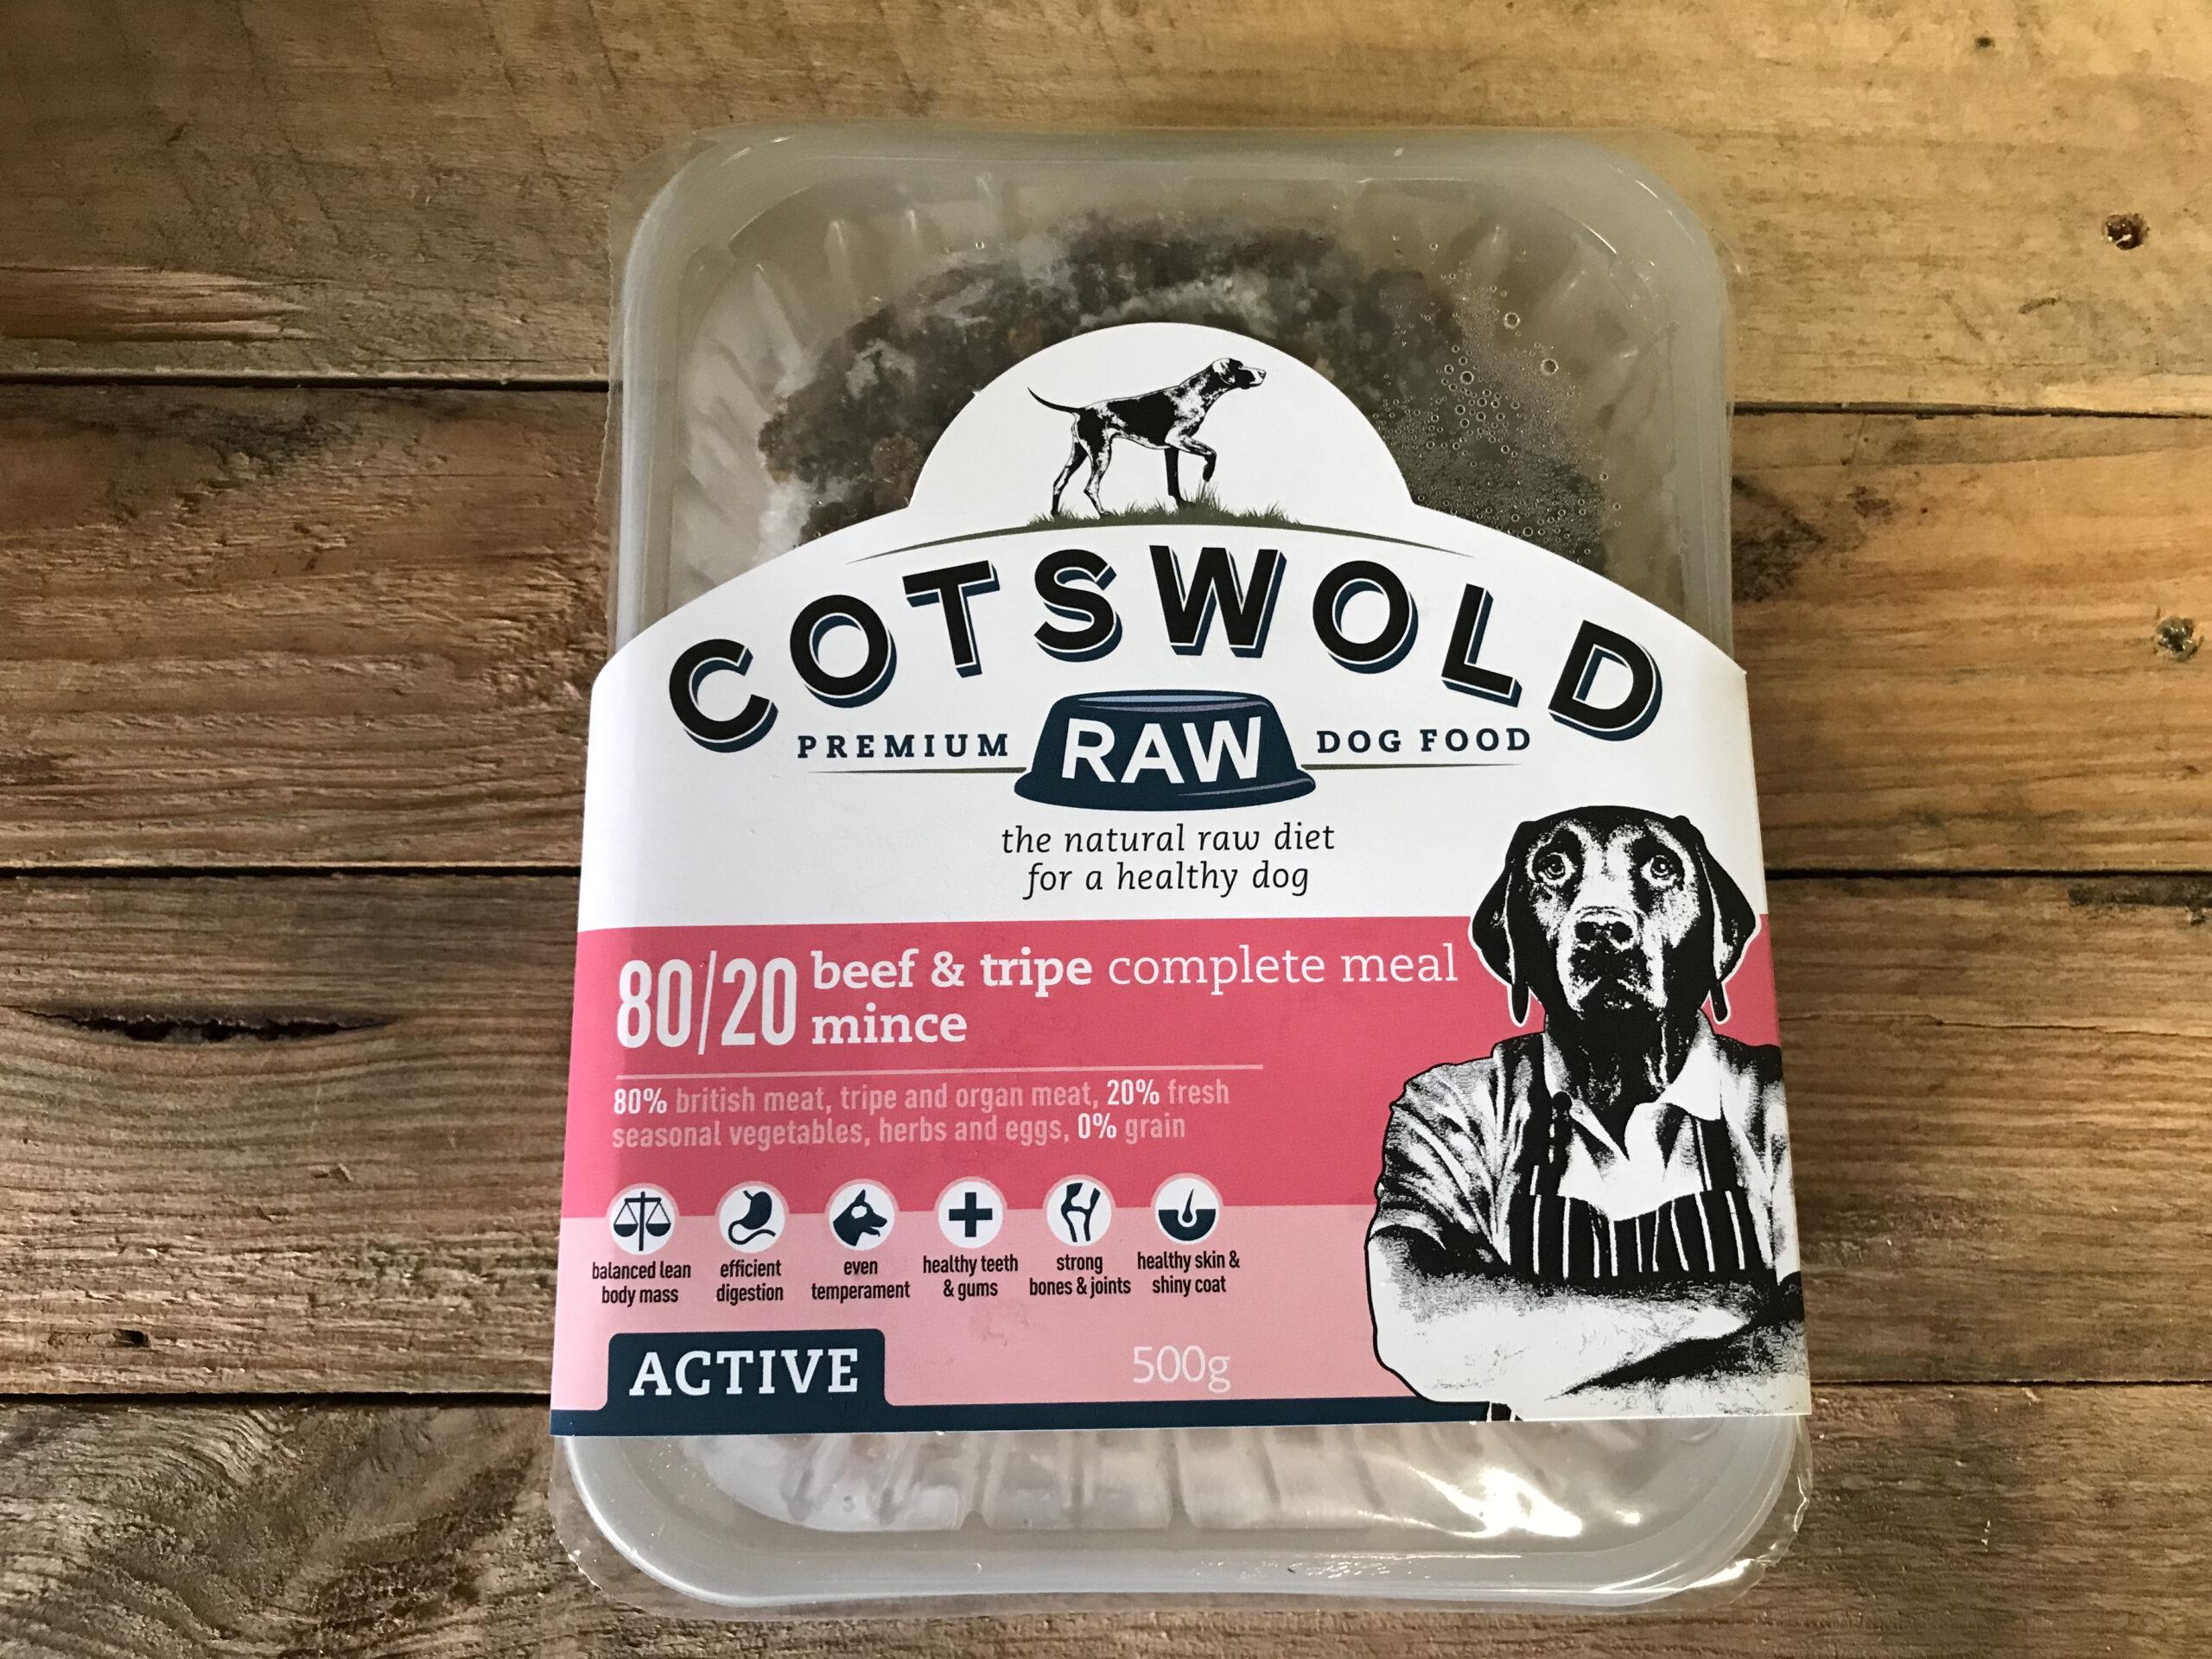 Cotswold Beef & Tripe 80/20 – 500g